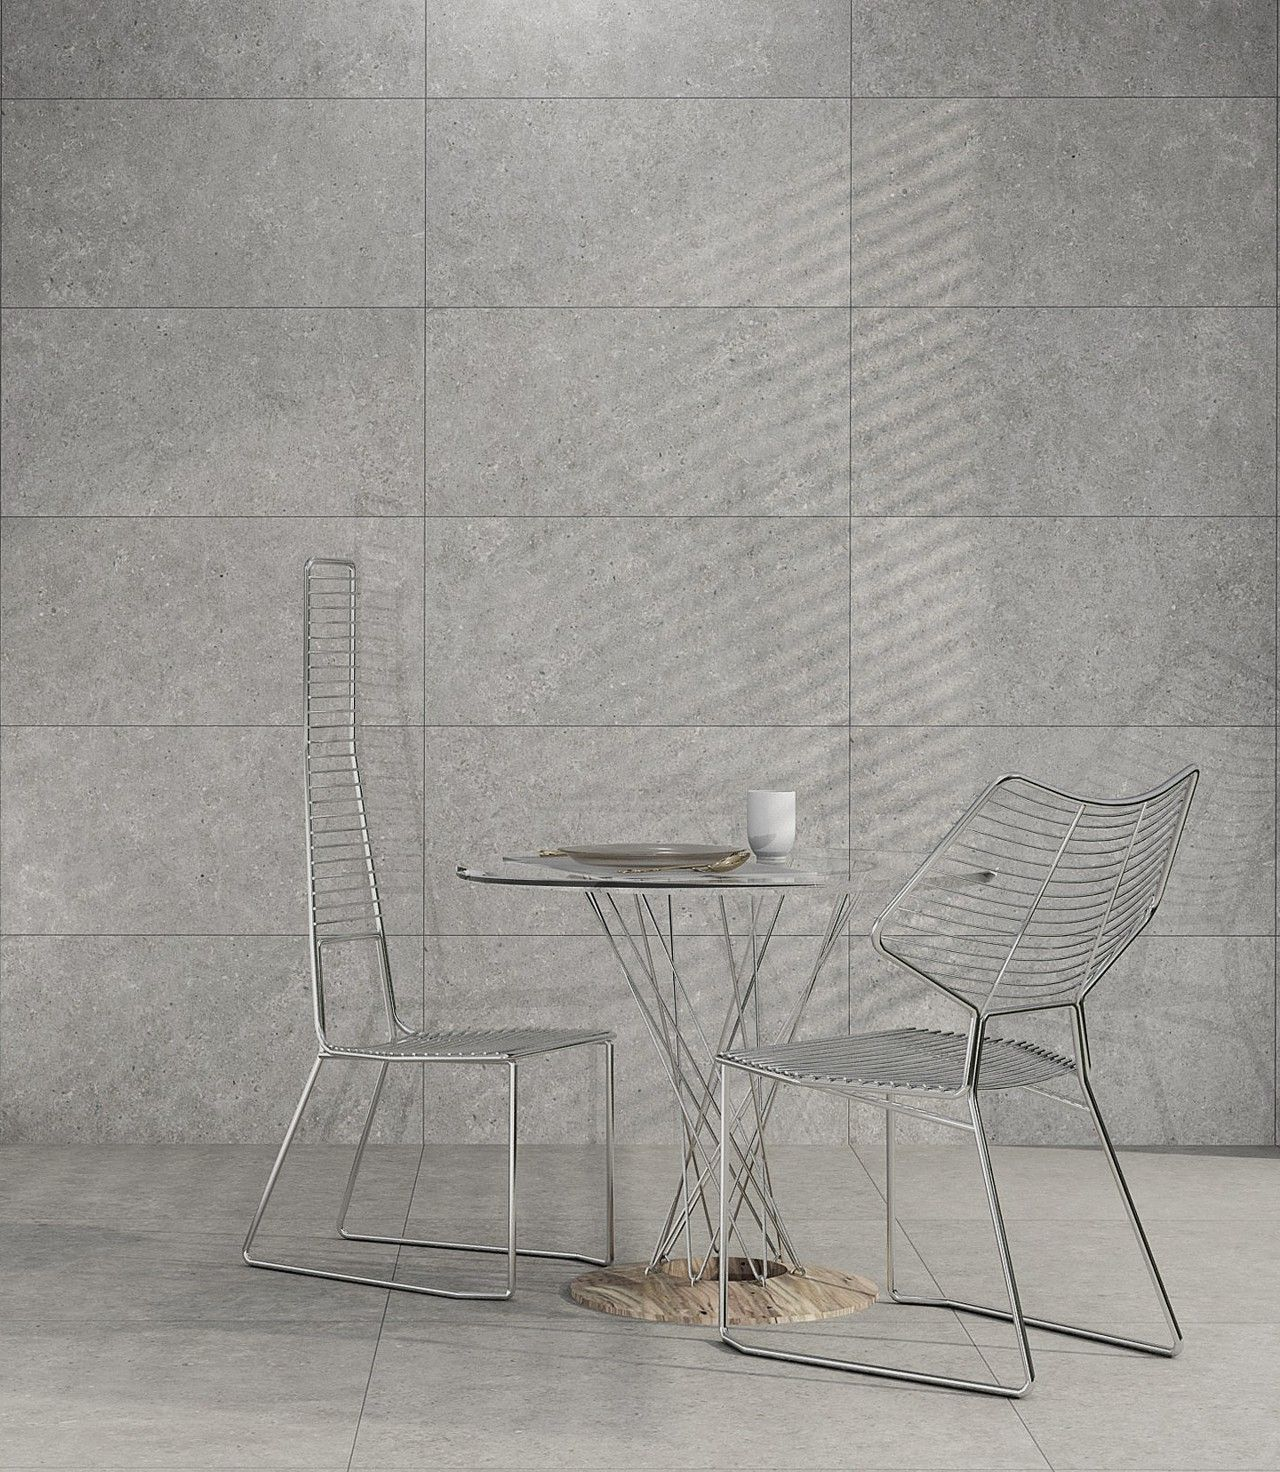 Azulejos by Living Ceramics, project by C. Renau, renderizado con V-Ray